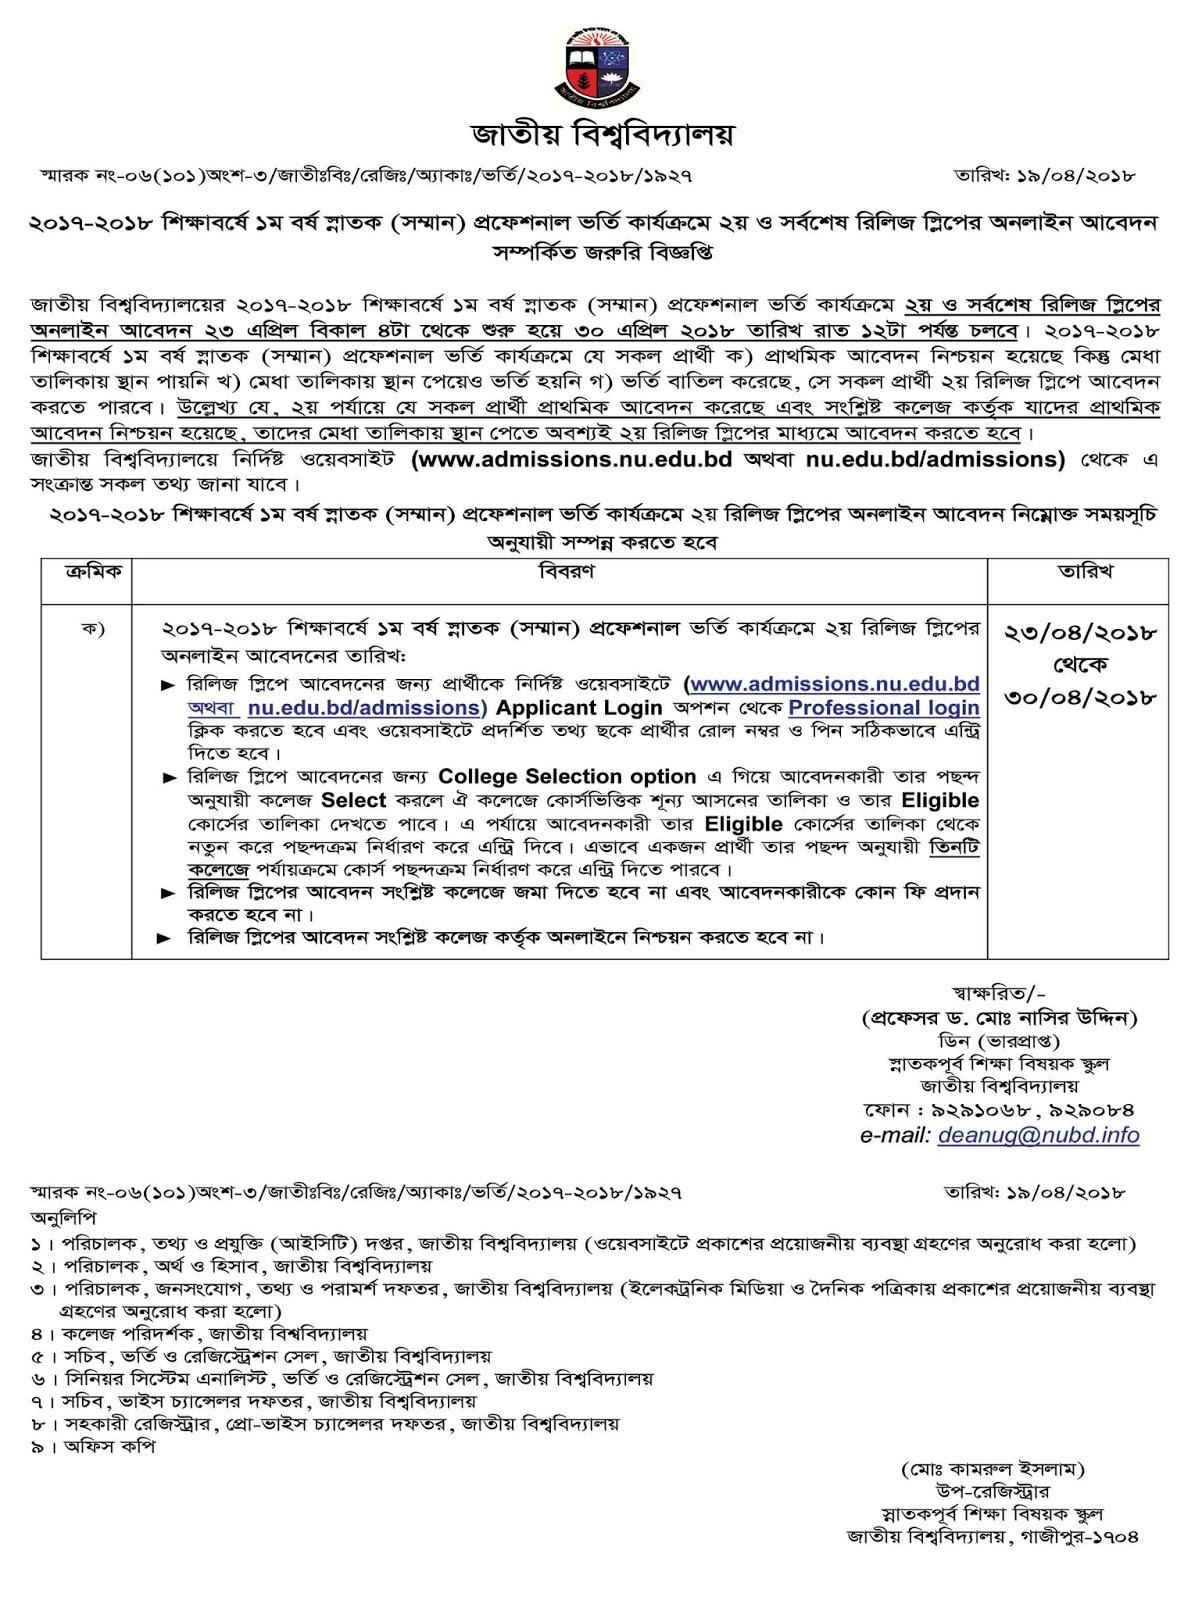 Honours (Professional) 2nd Release Slip Admission Notice - nu edu bd admission